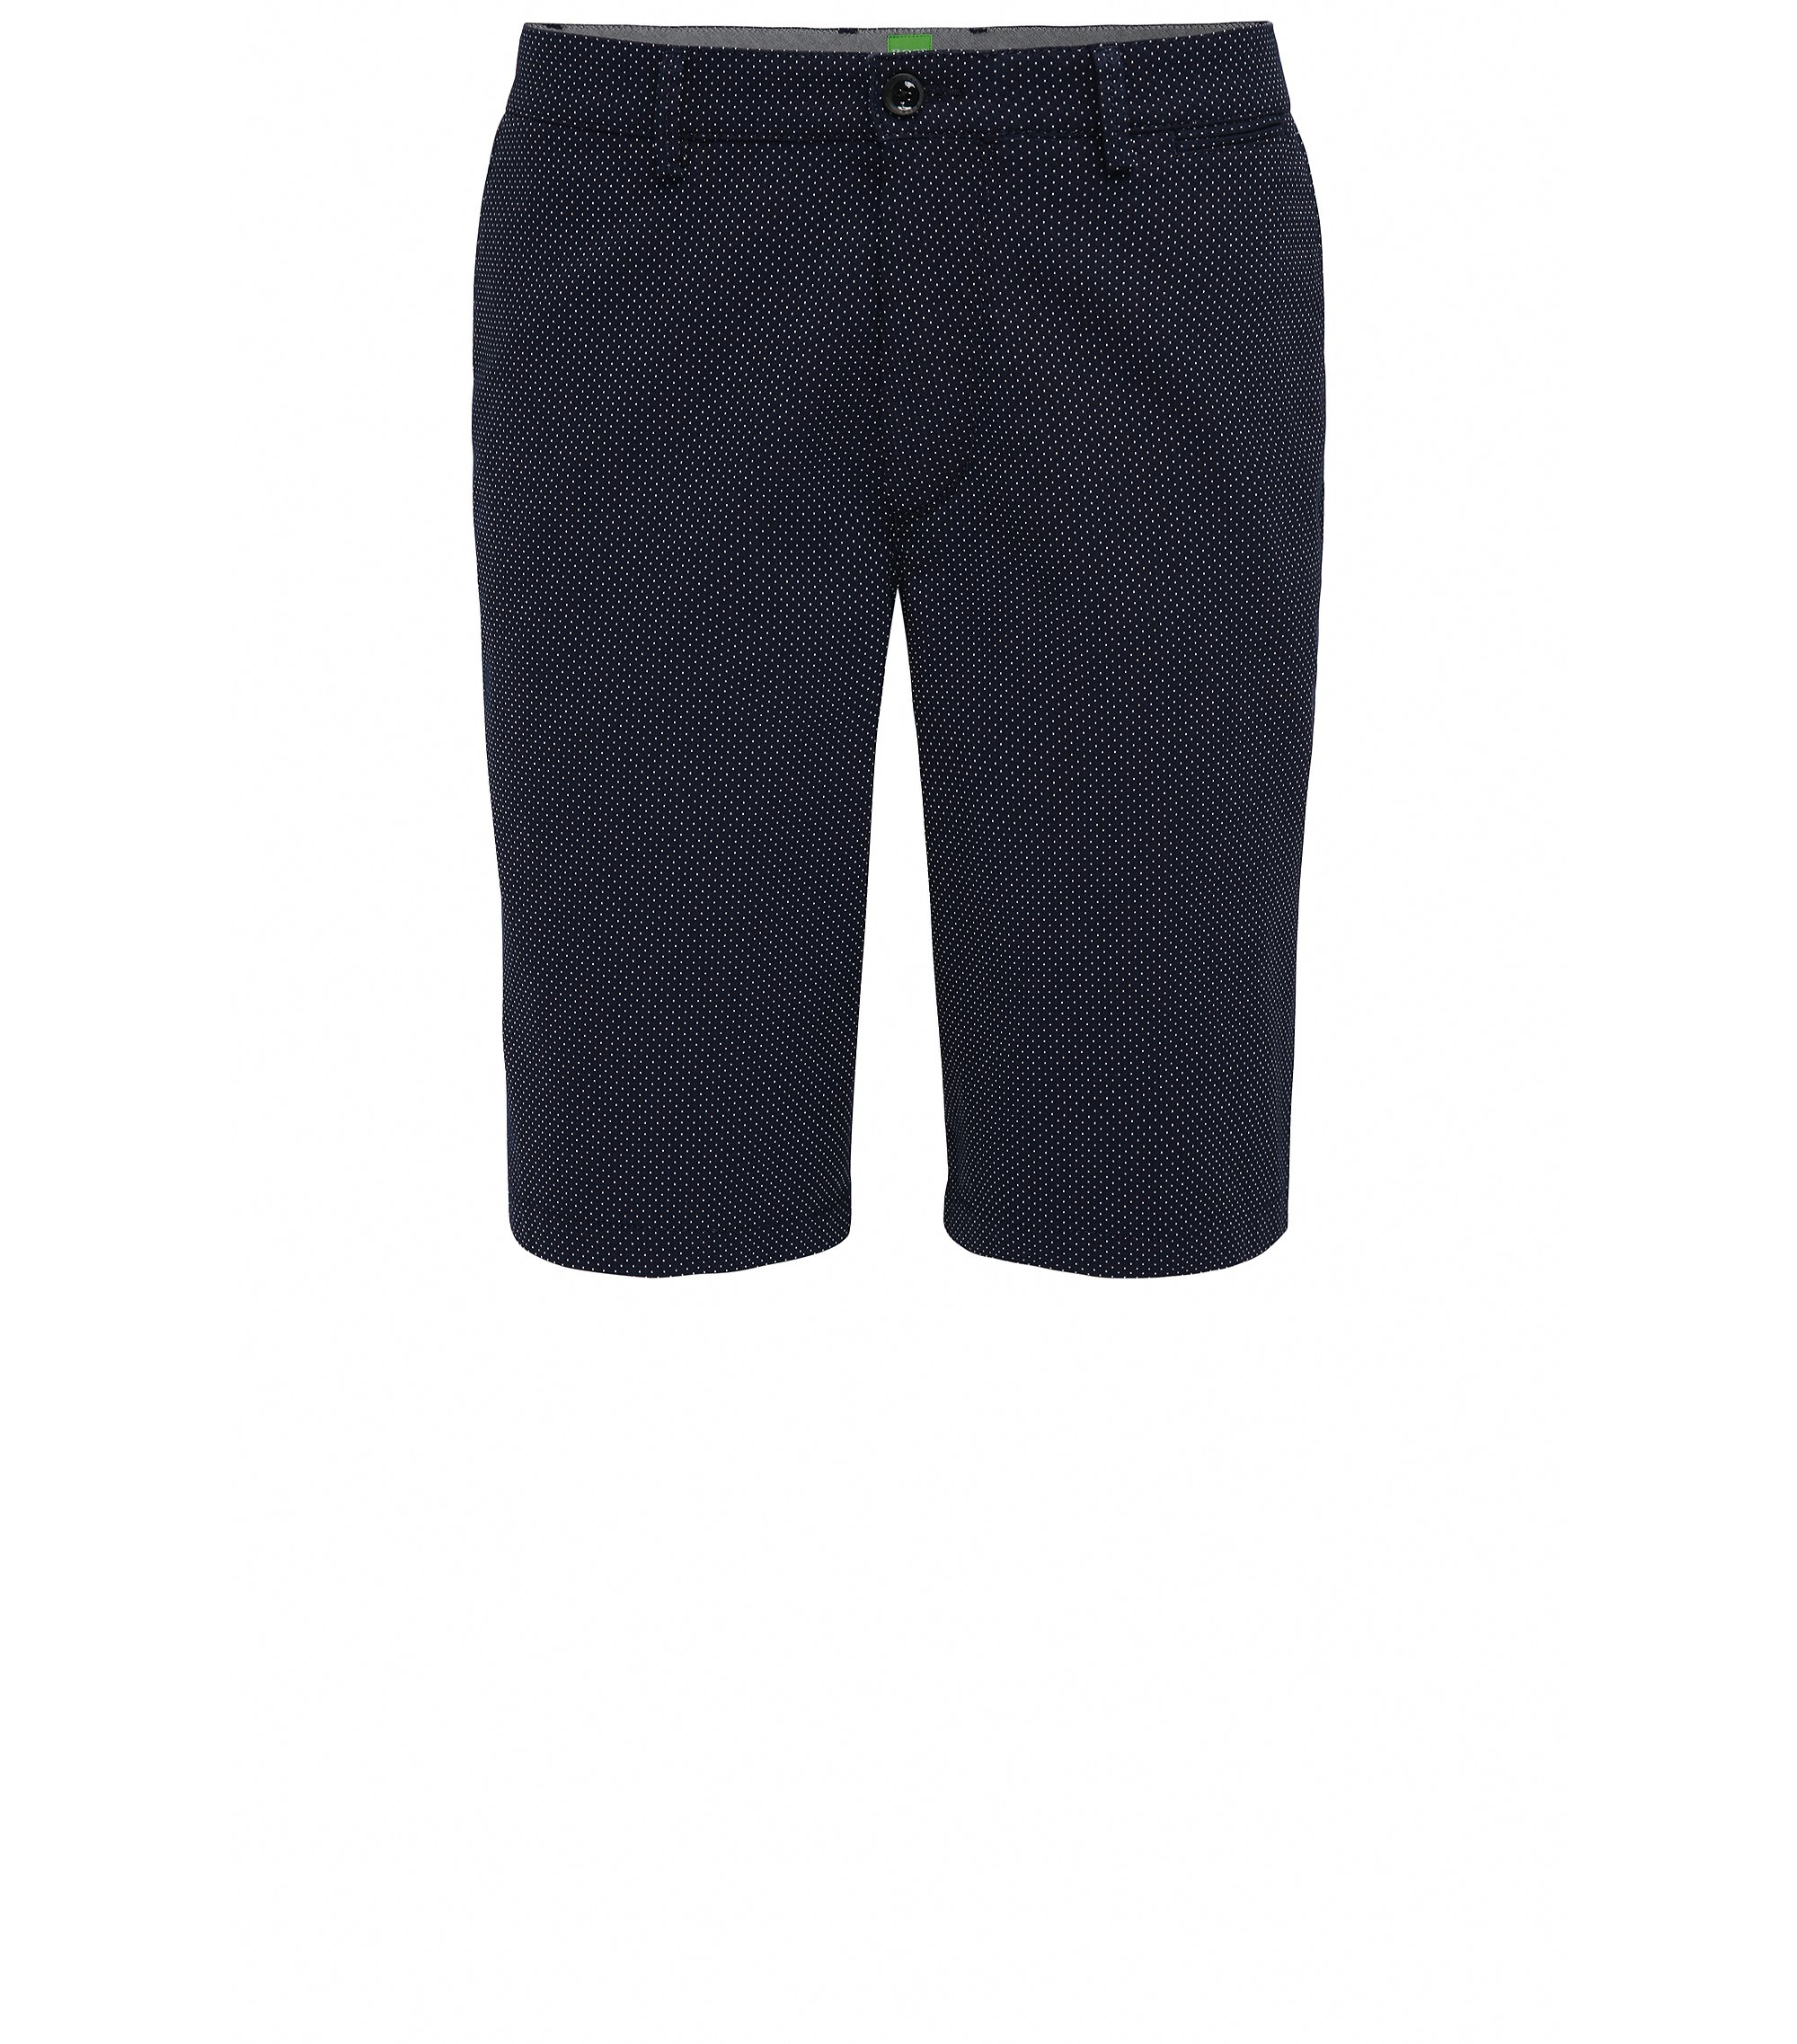 Shorts regular fit en jacquard de puntitos, Azul oscuro